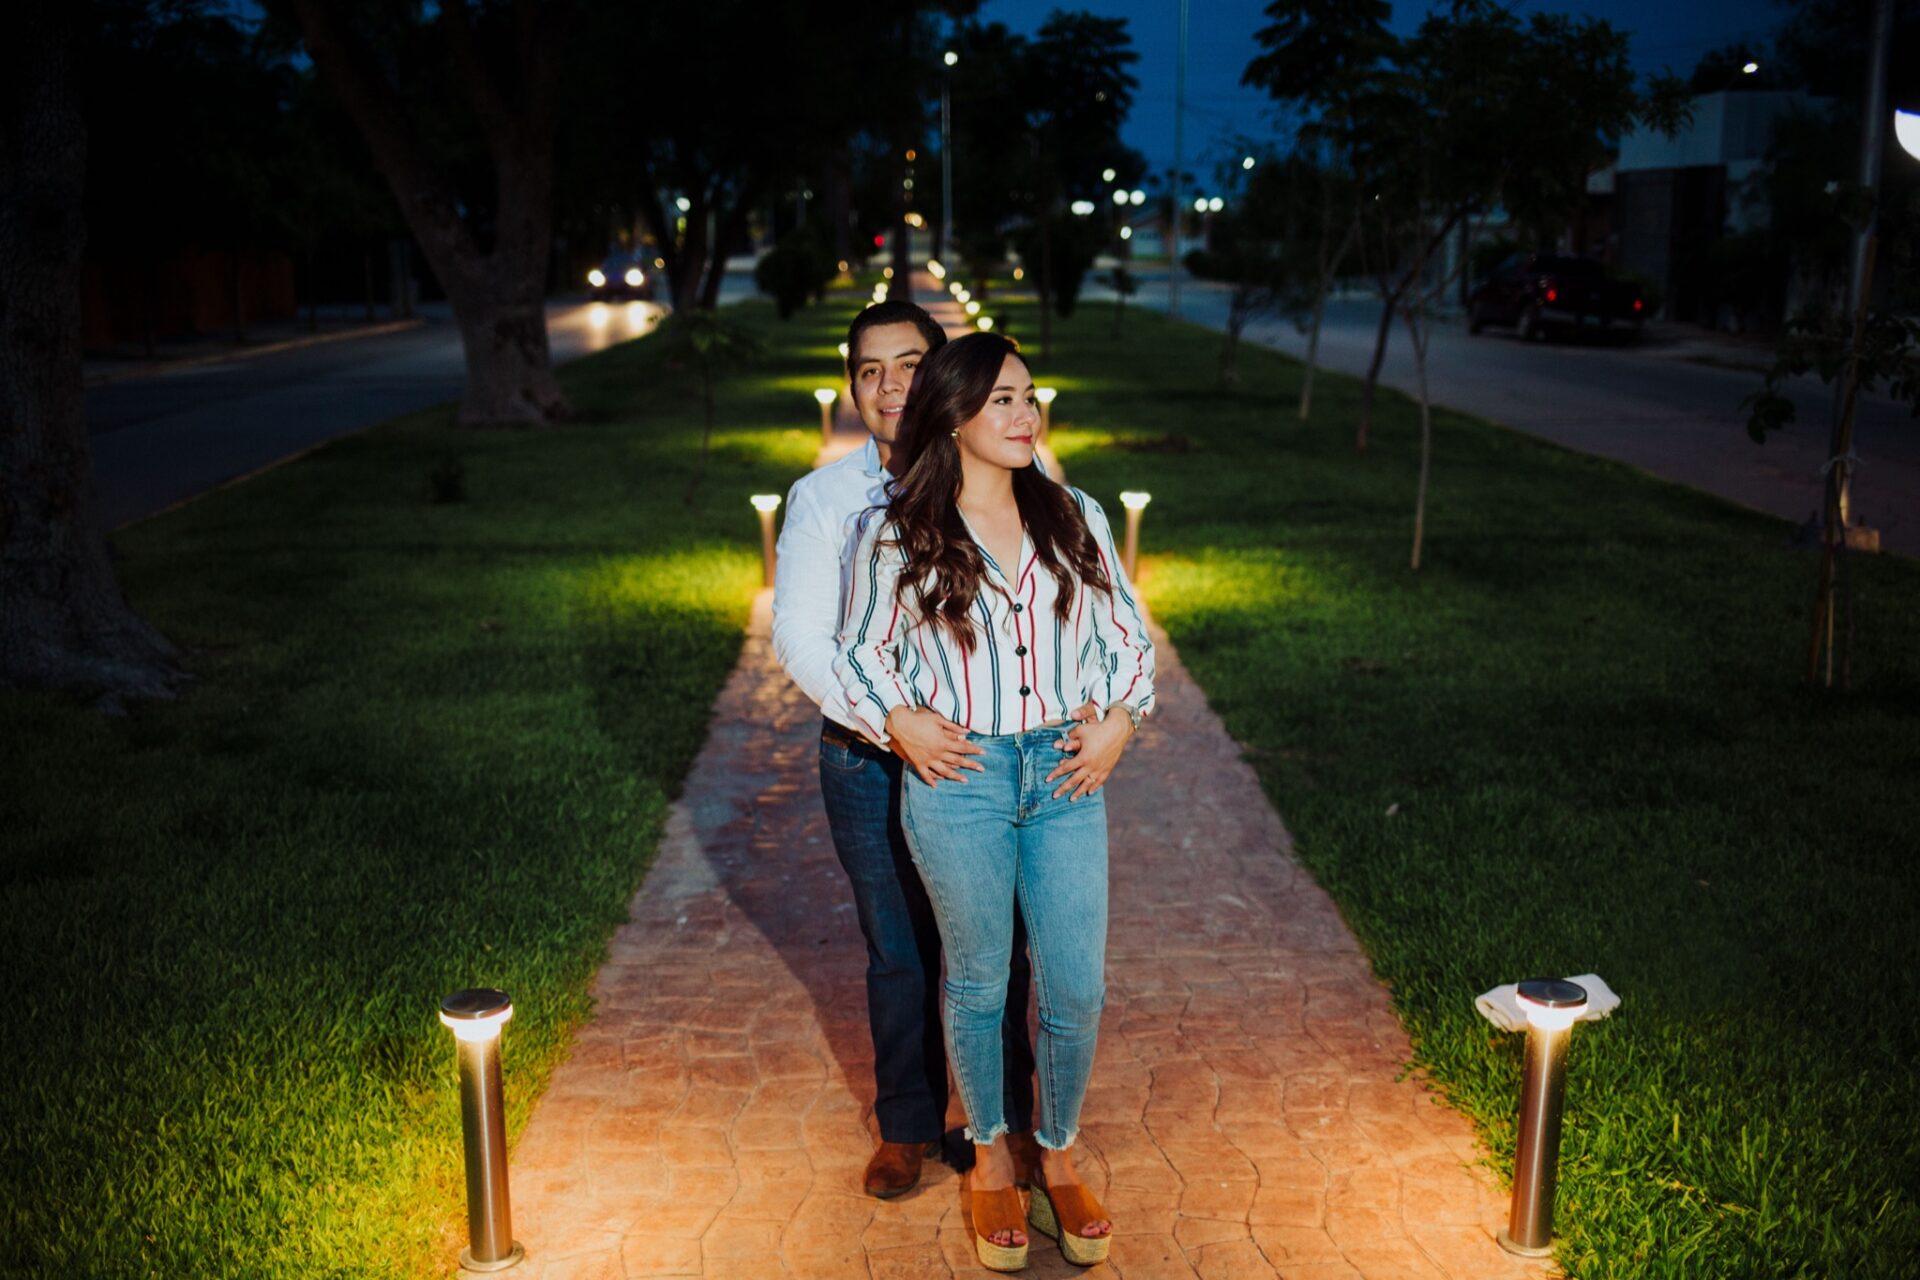 javier_noriega_fotografo_bodas_save_the_date_preboda_torreon_coahuila_zacatecas_wedding_photographer3